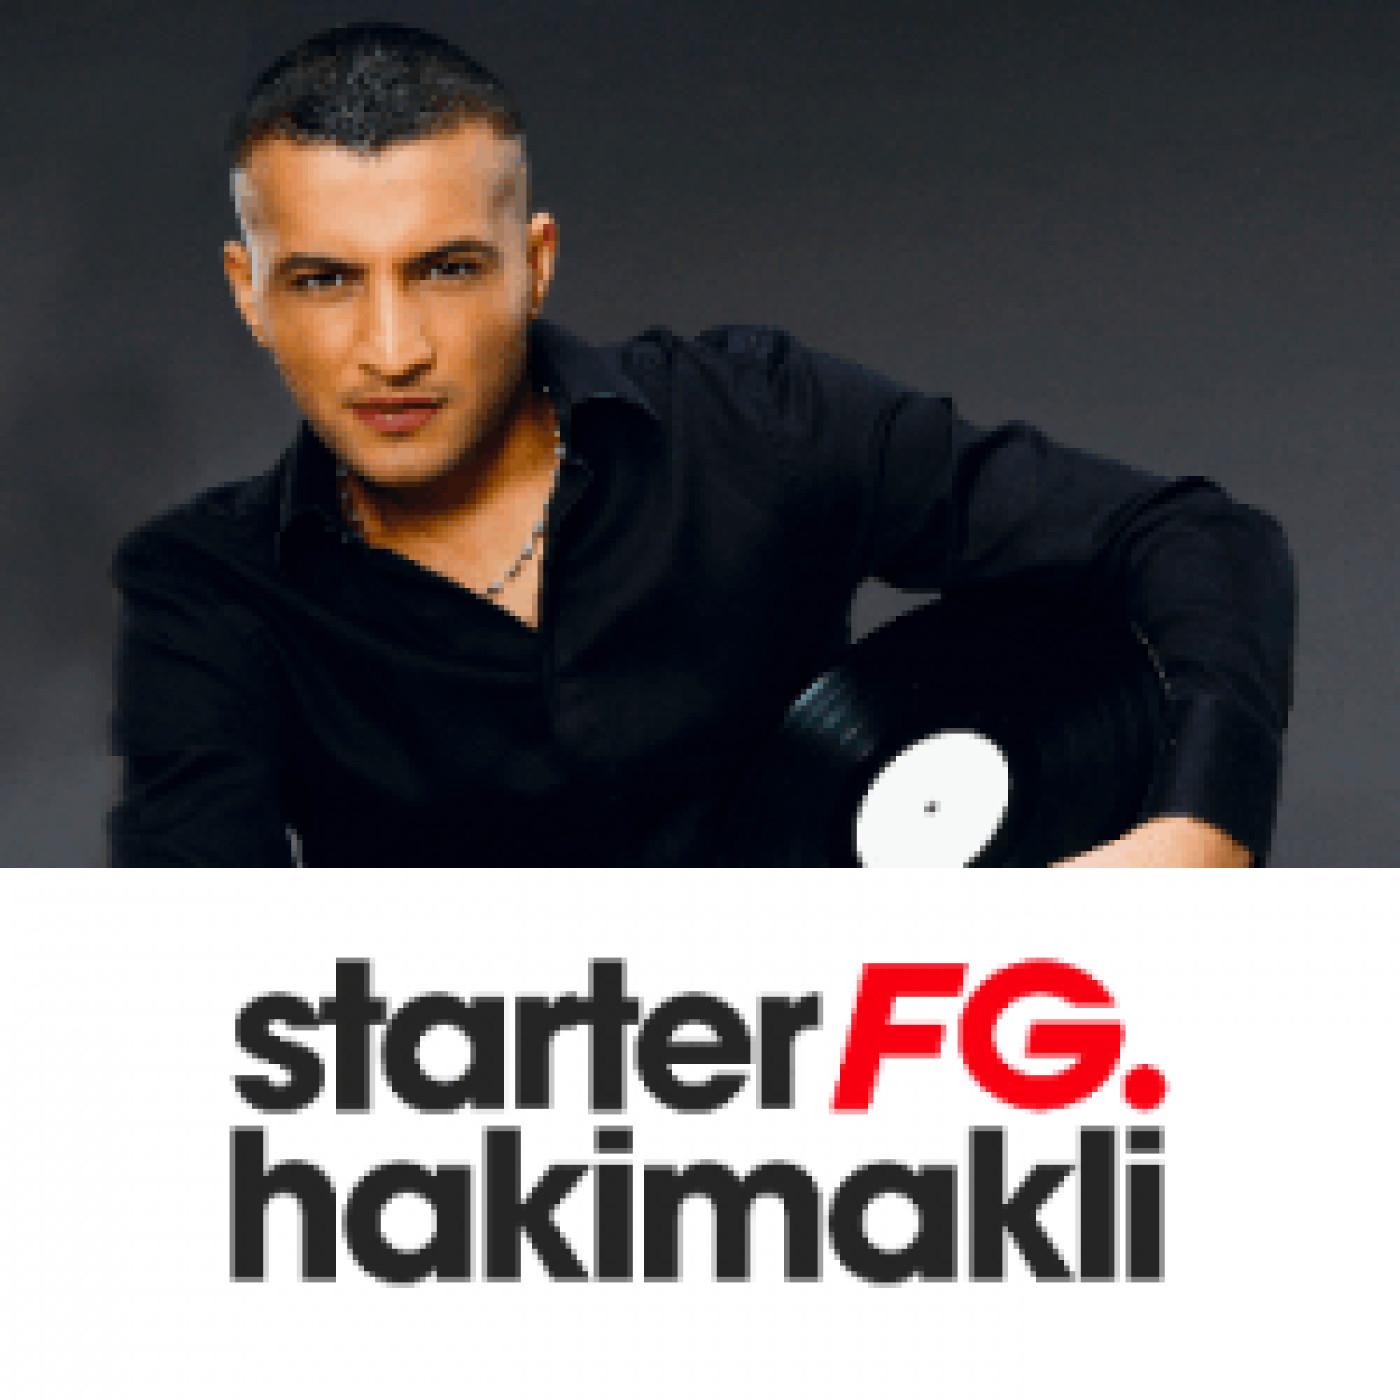 STARTER FG BY HAKIMAKLI MERCREDI 9 DECEMBRE 2020